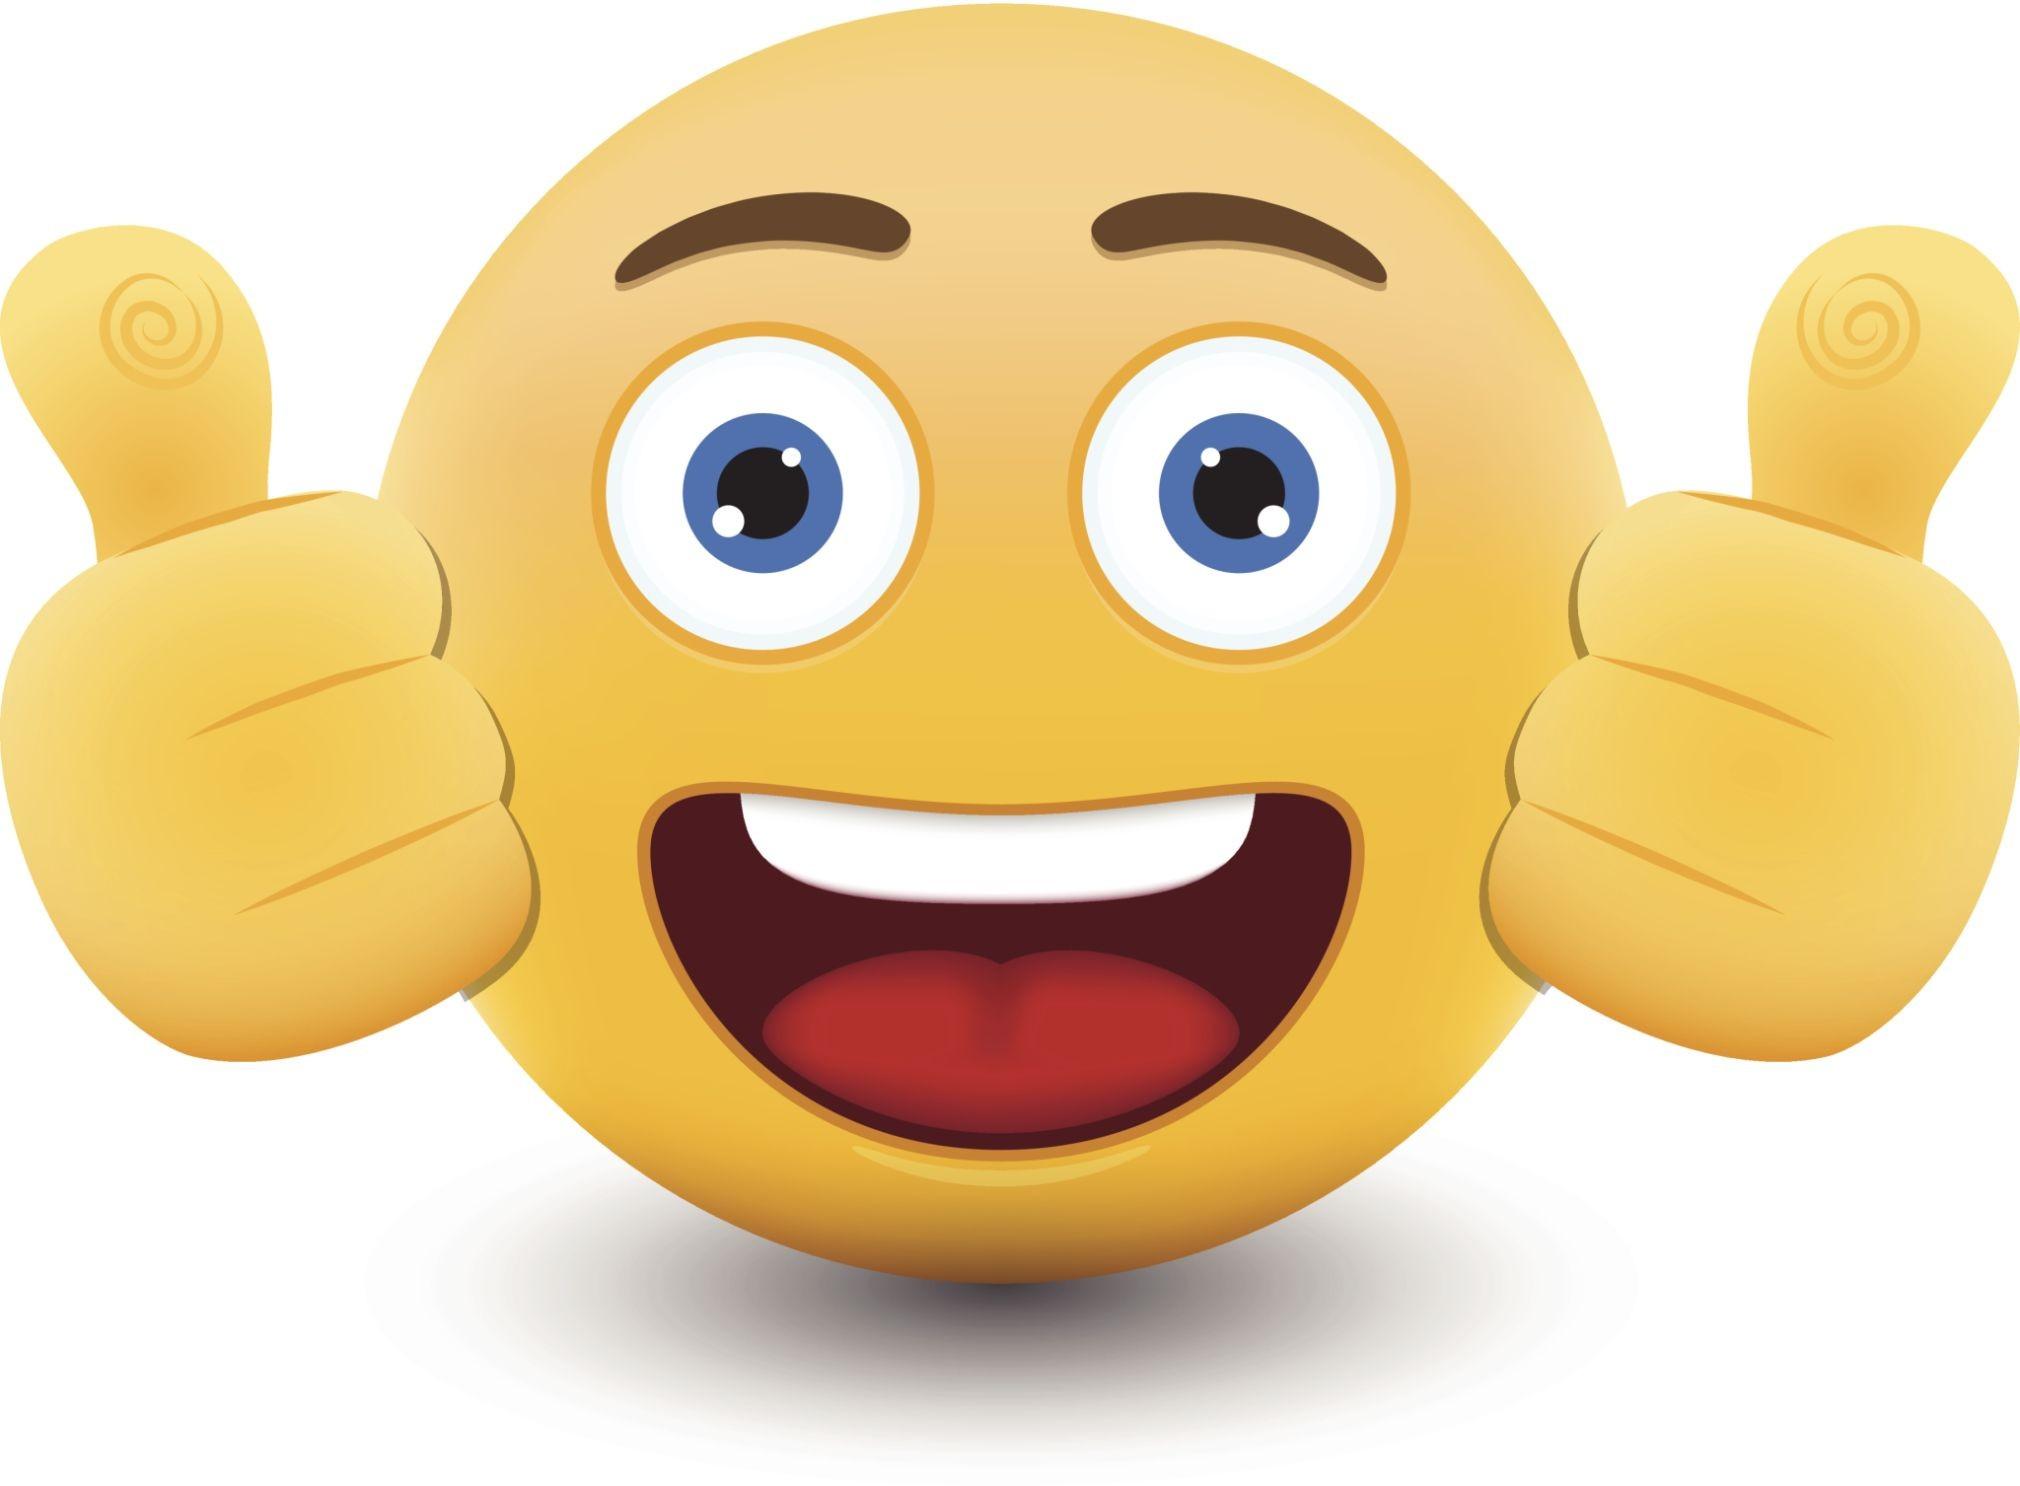 Emoji Wallpaper 1920x1200 Tablet